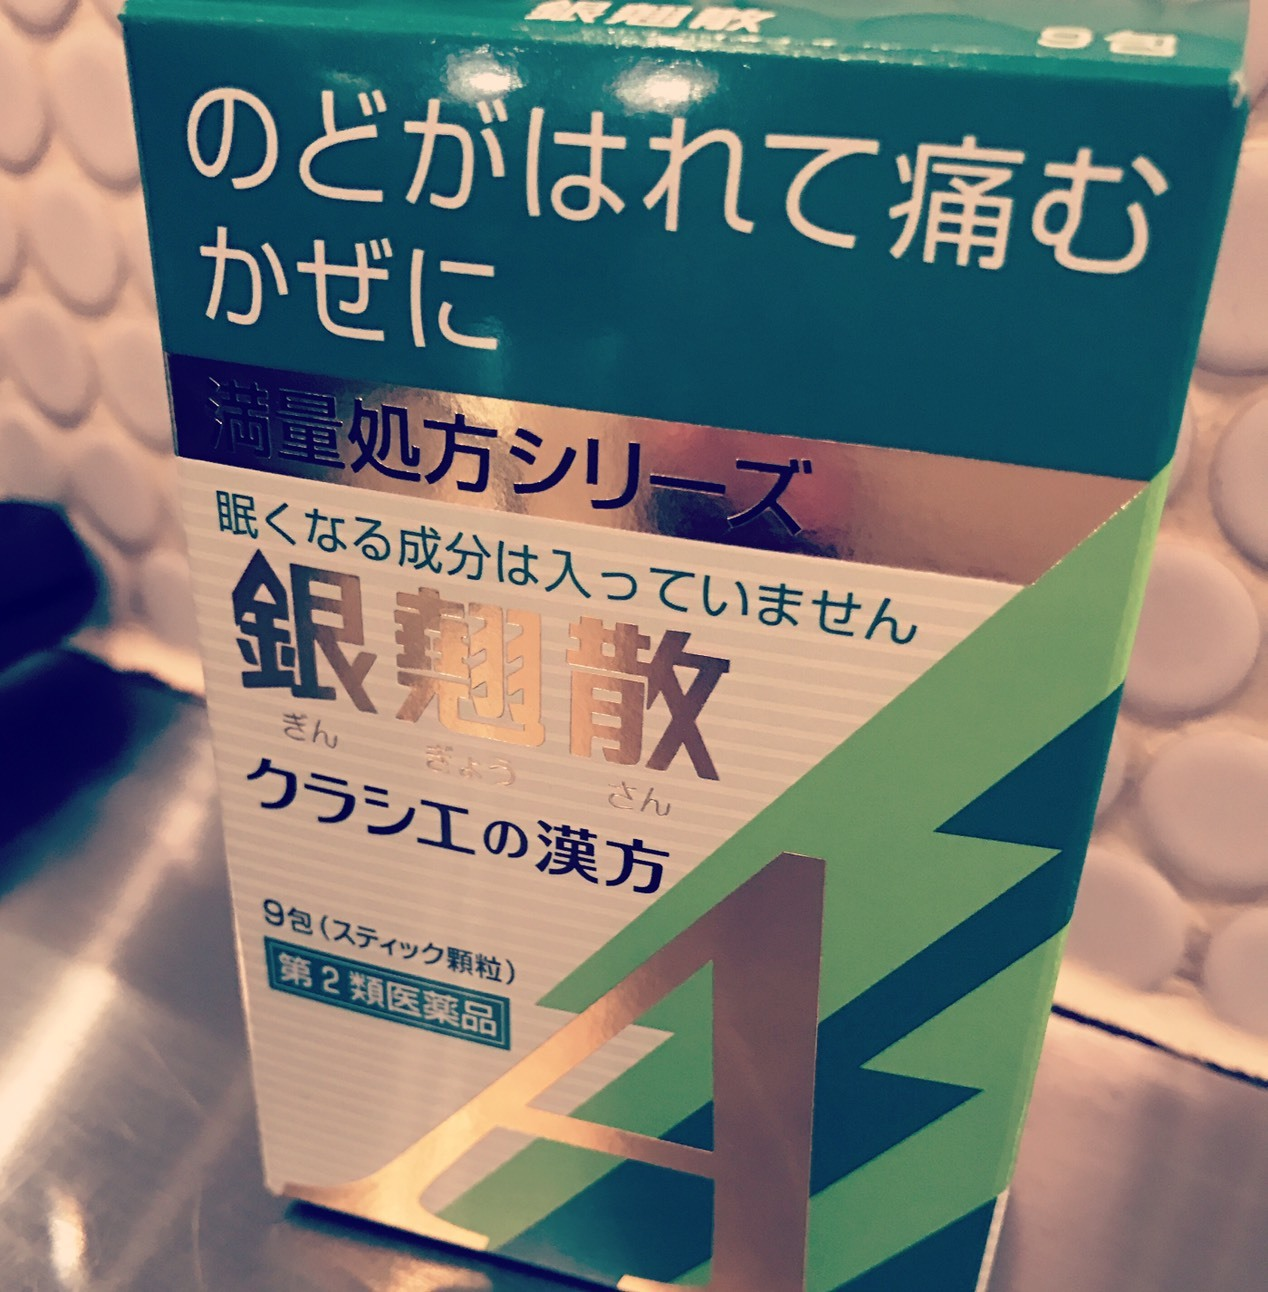 S__38133793.jpg